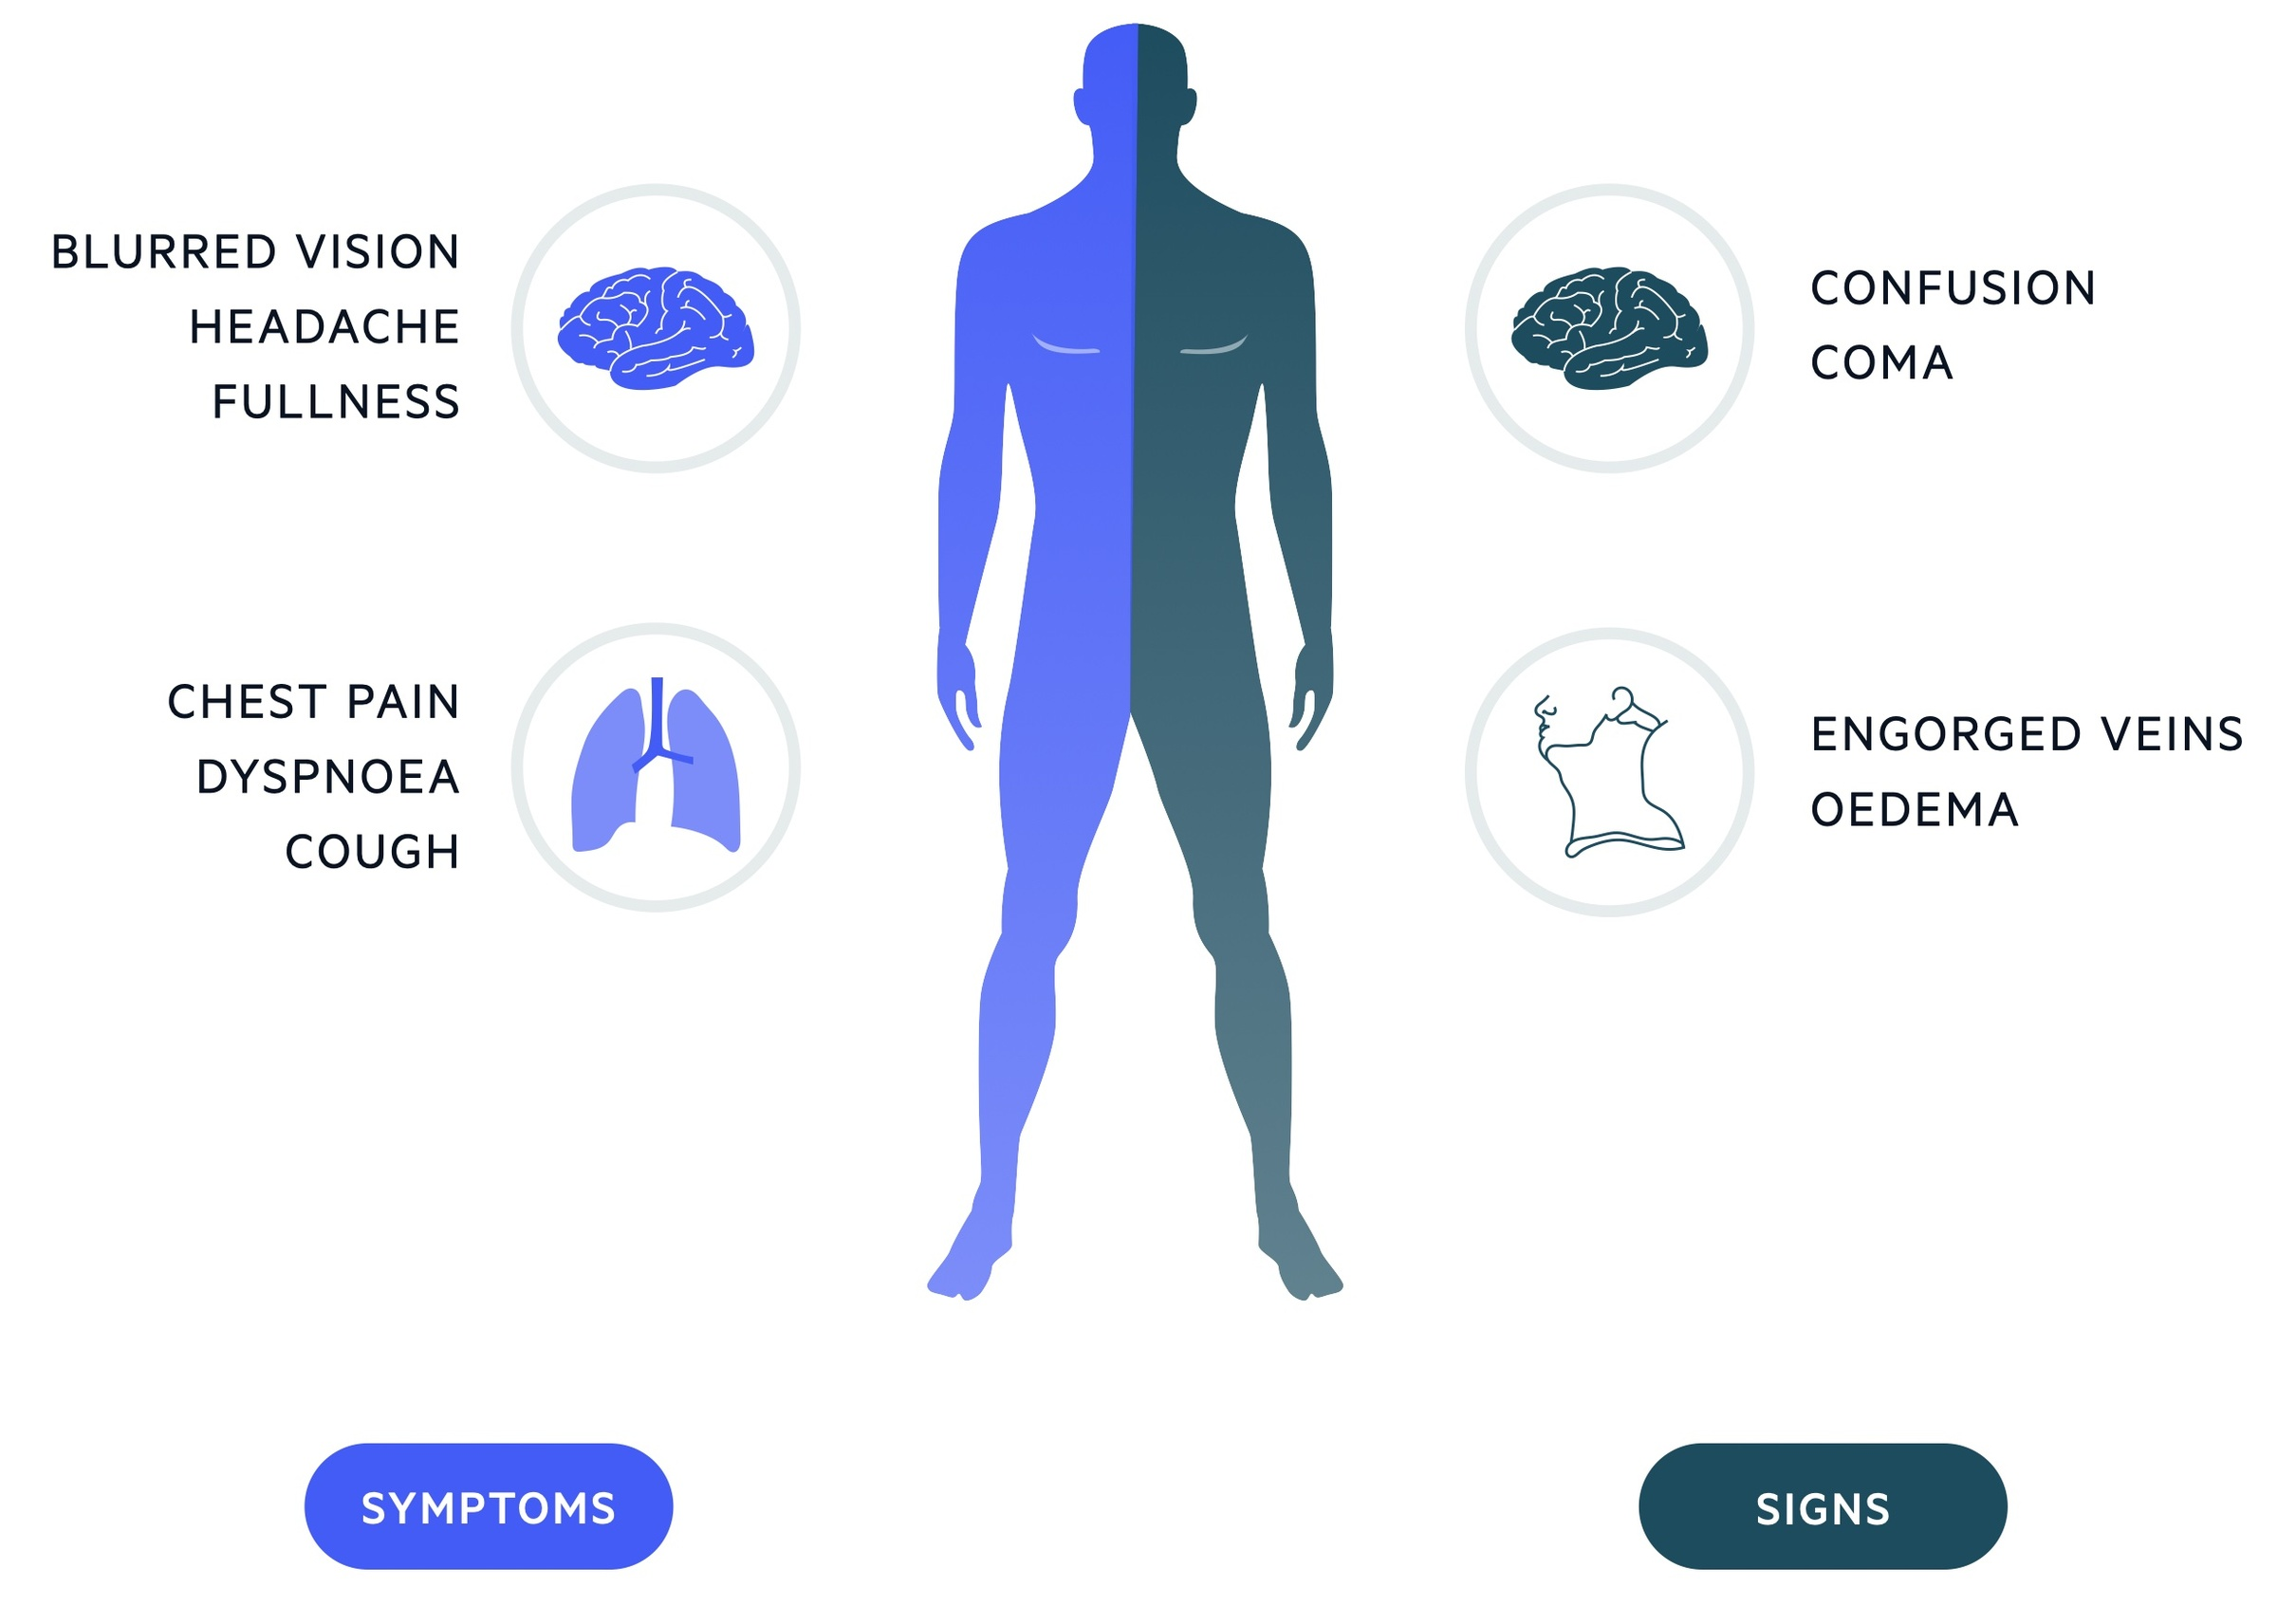 Clinical features of superior vena cava obstruction (SVCO)